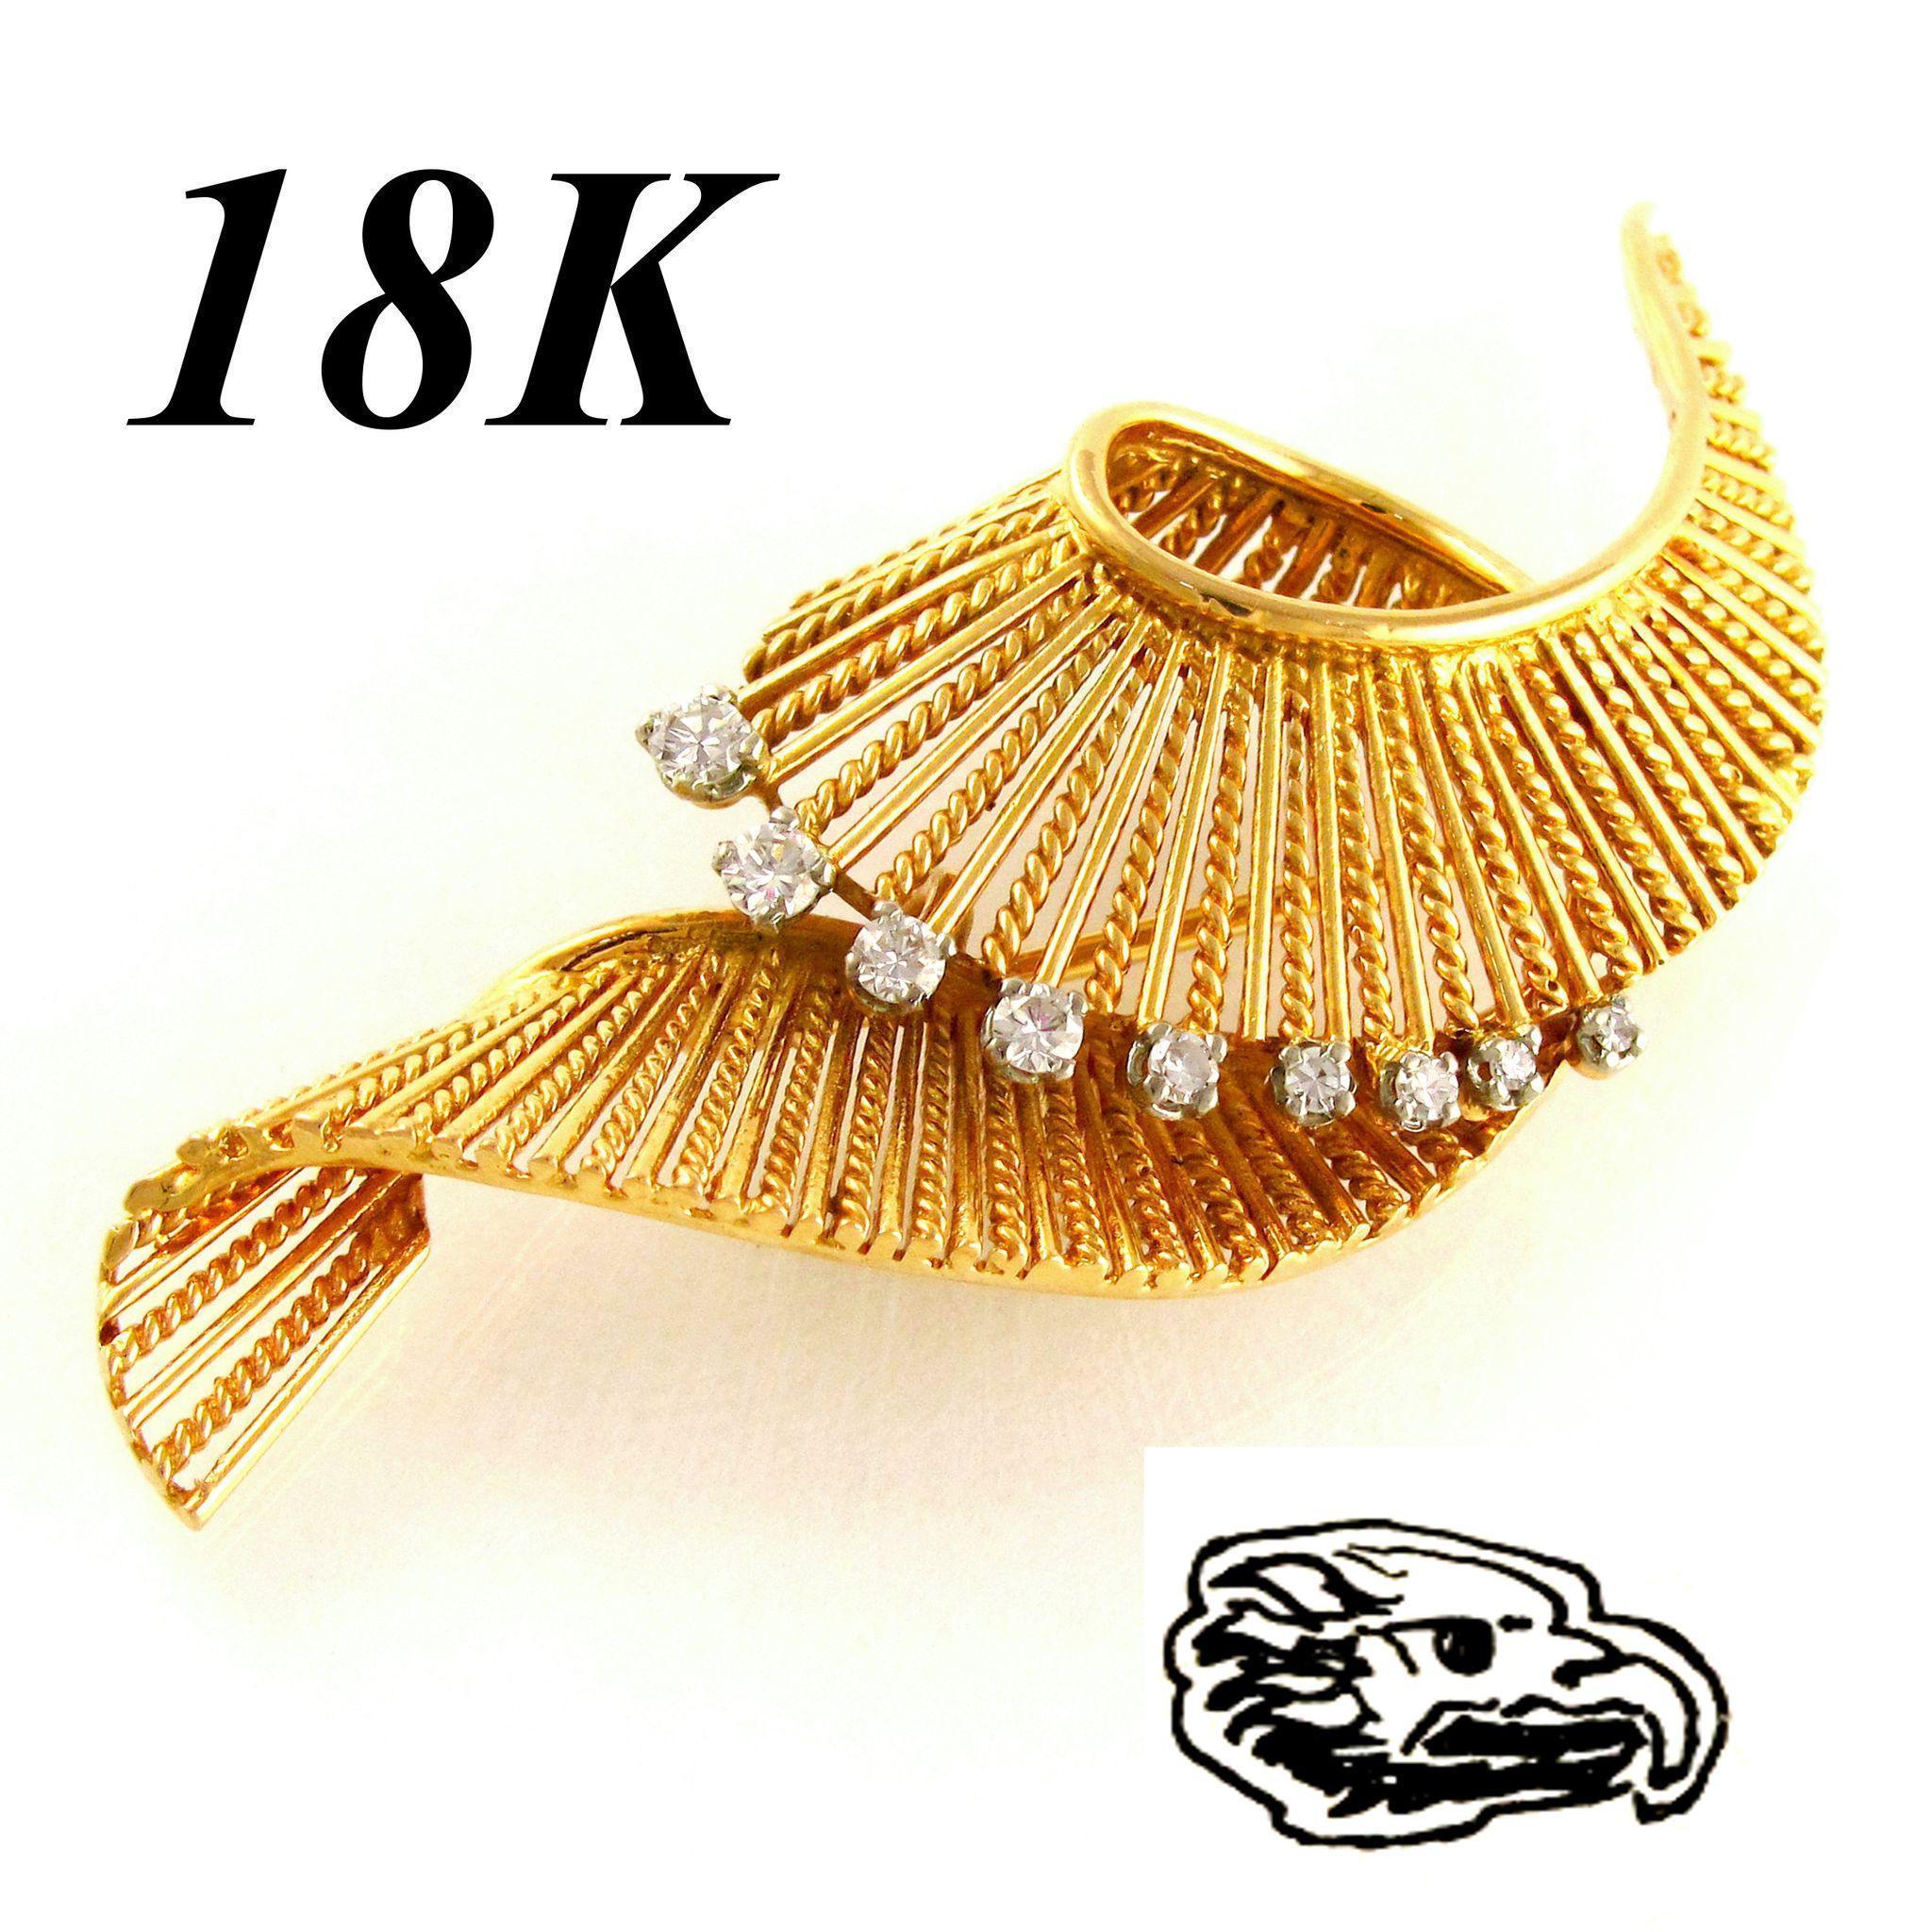 French 18K Yellow Gold & Diamond Swirl Brooch Pin